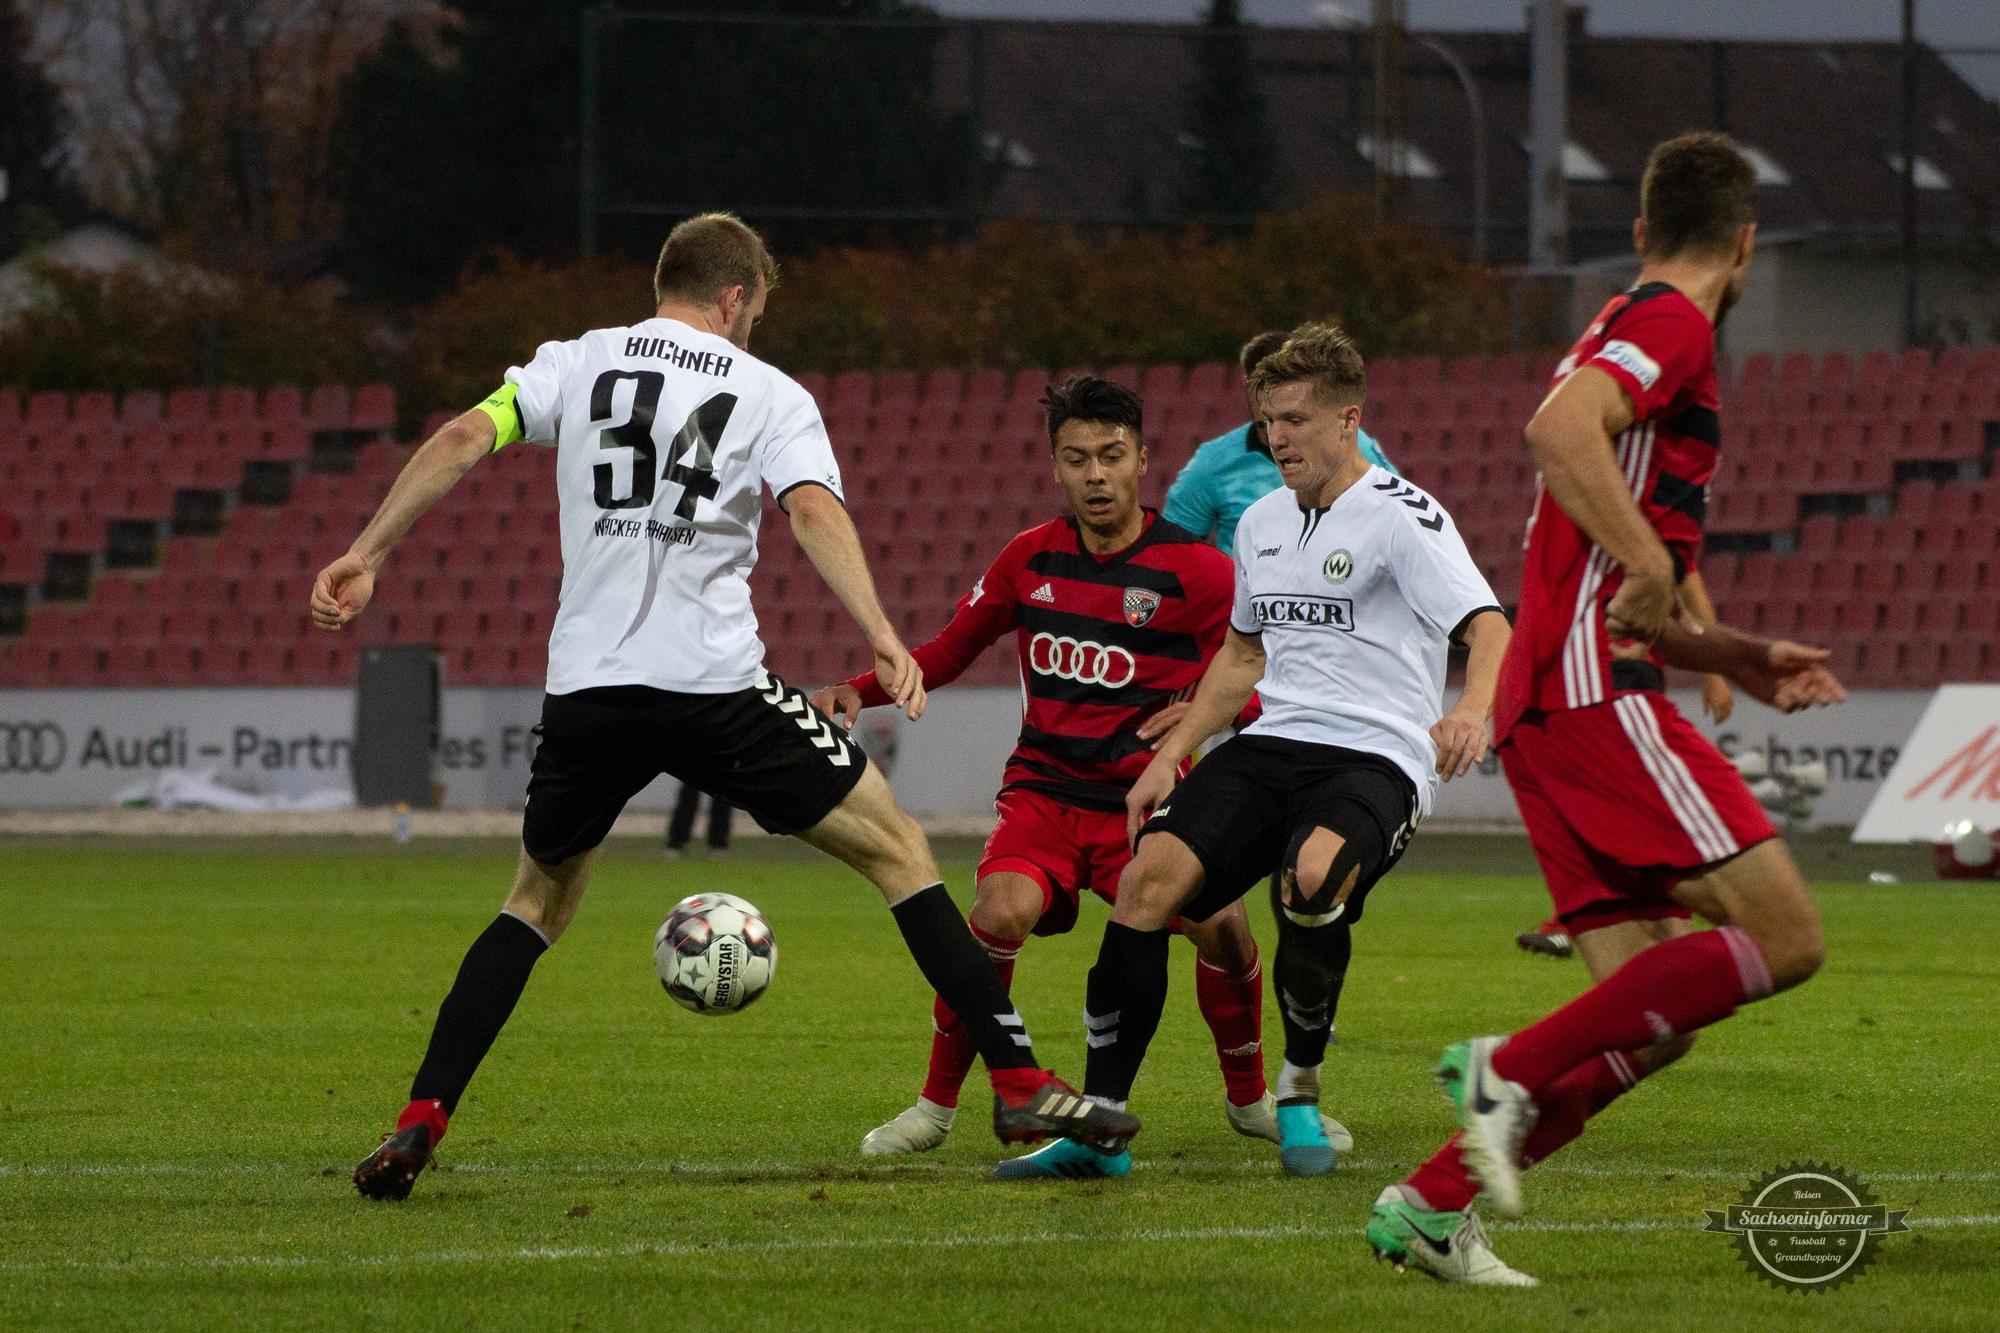 BZA Süd-Ost - FC Ingolstadt